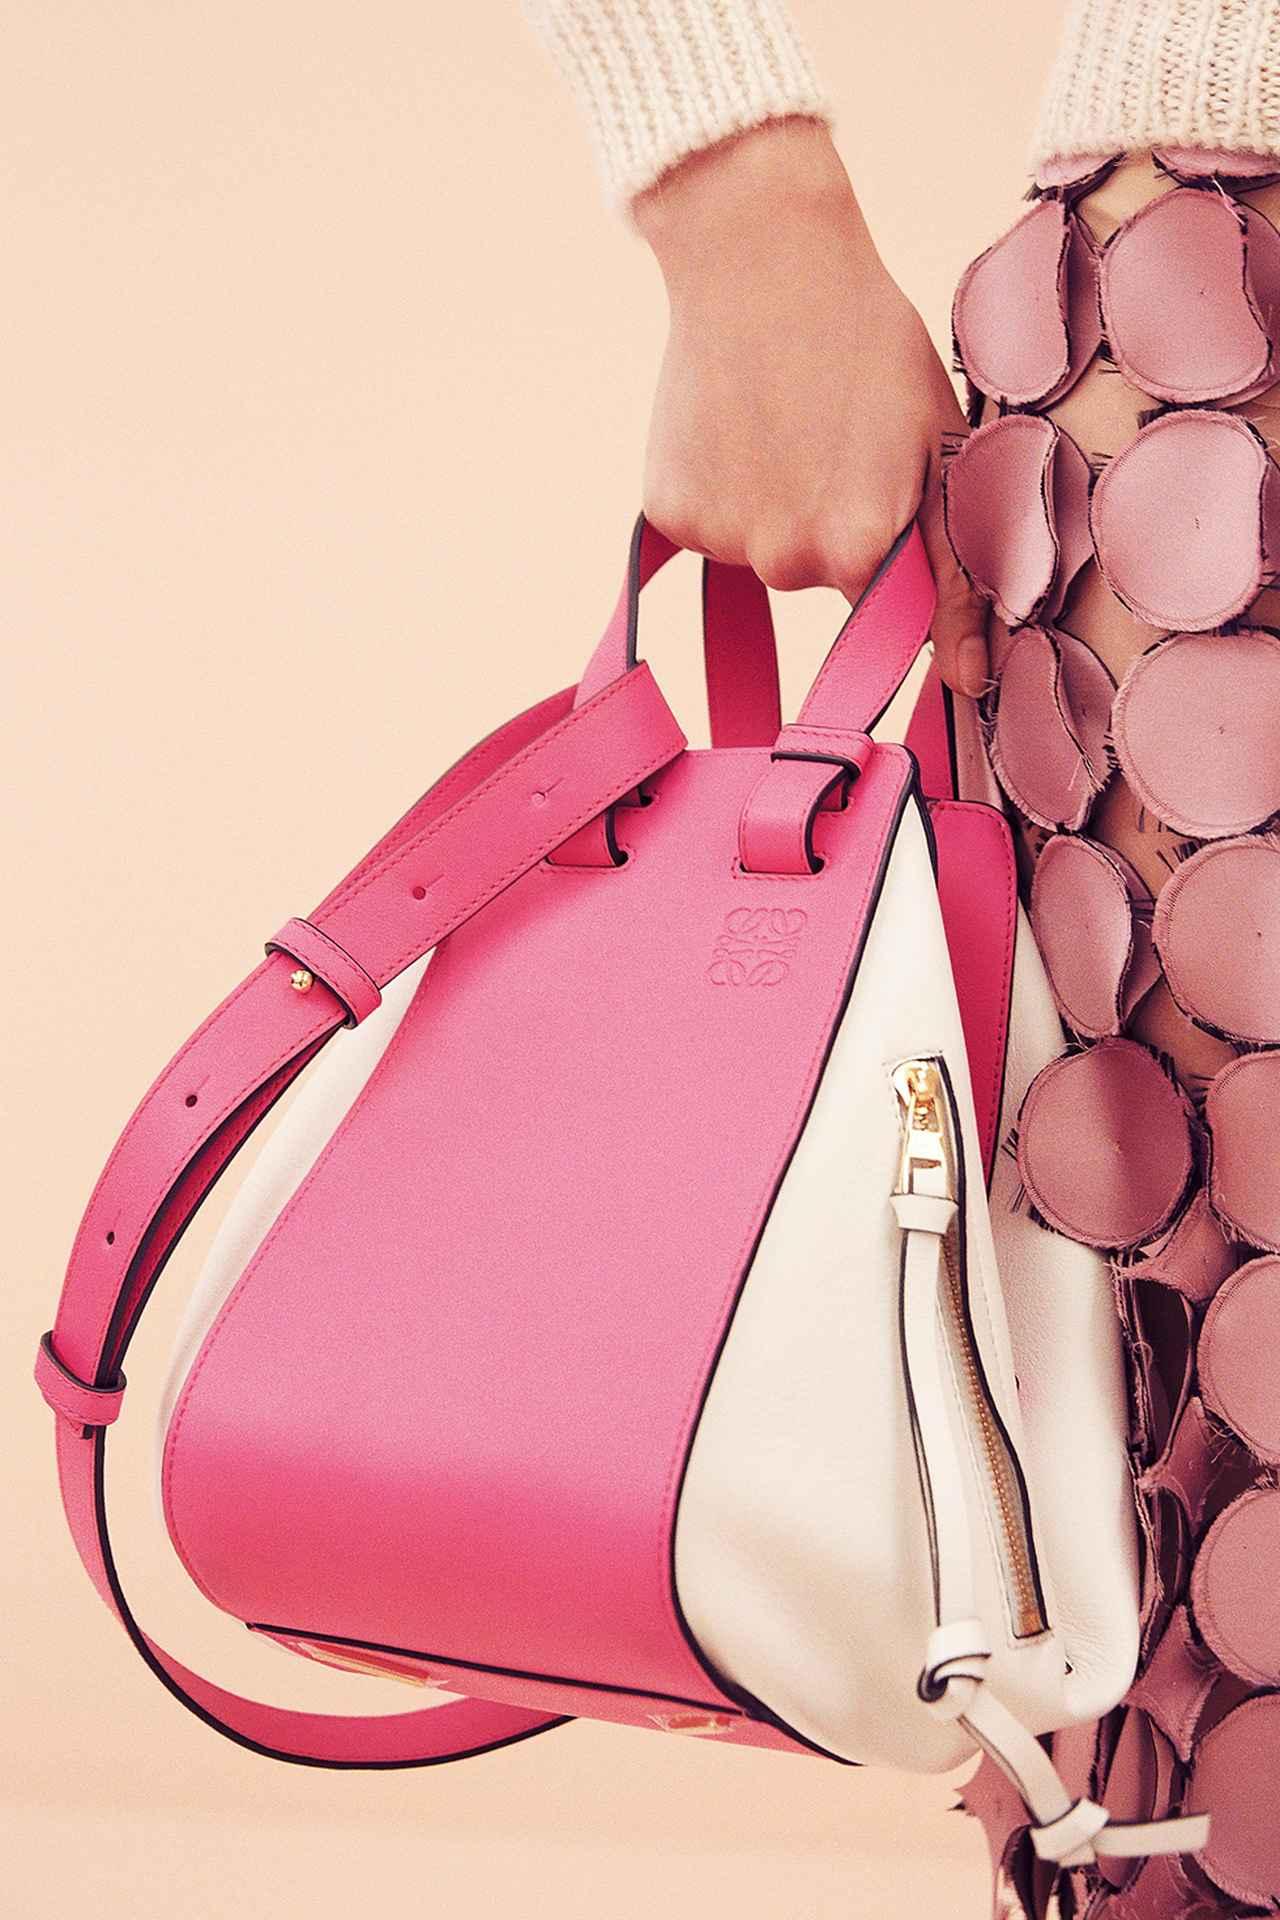 Images : 4番目の画像 - 「洗練のピンク」のアルバム - T JAPAN:The New York Times Style Magazine 公式サイト